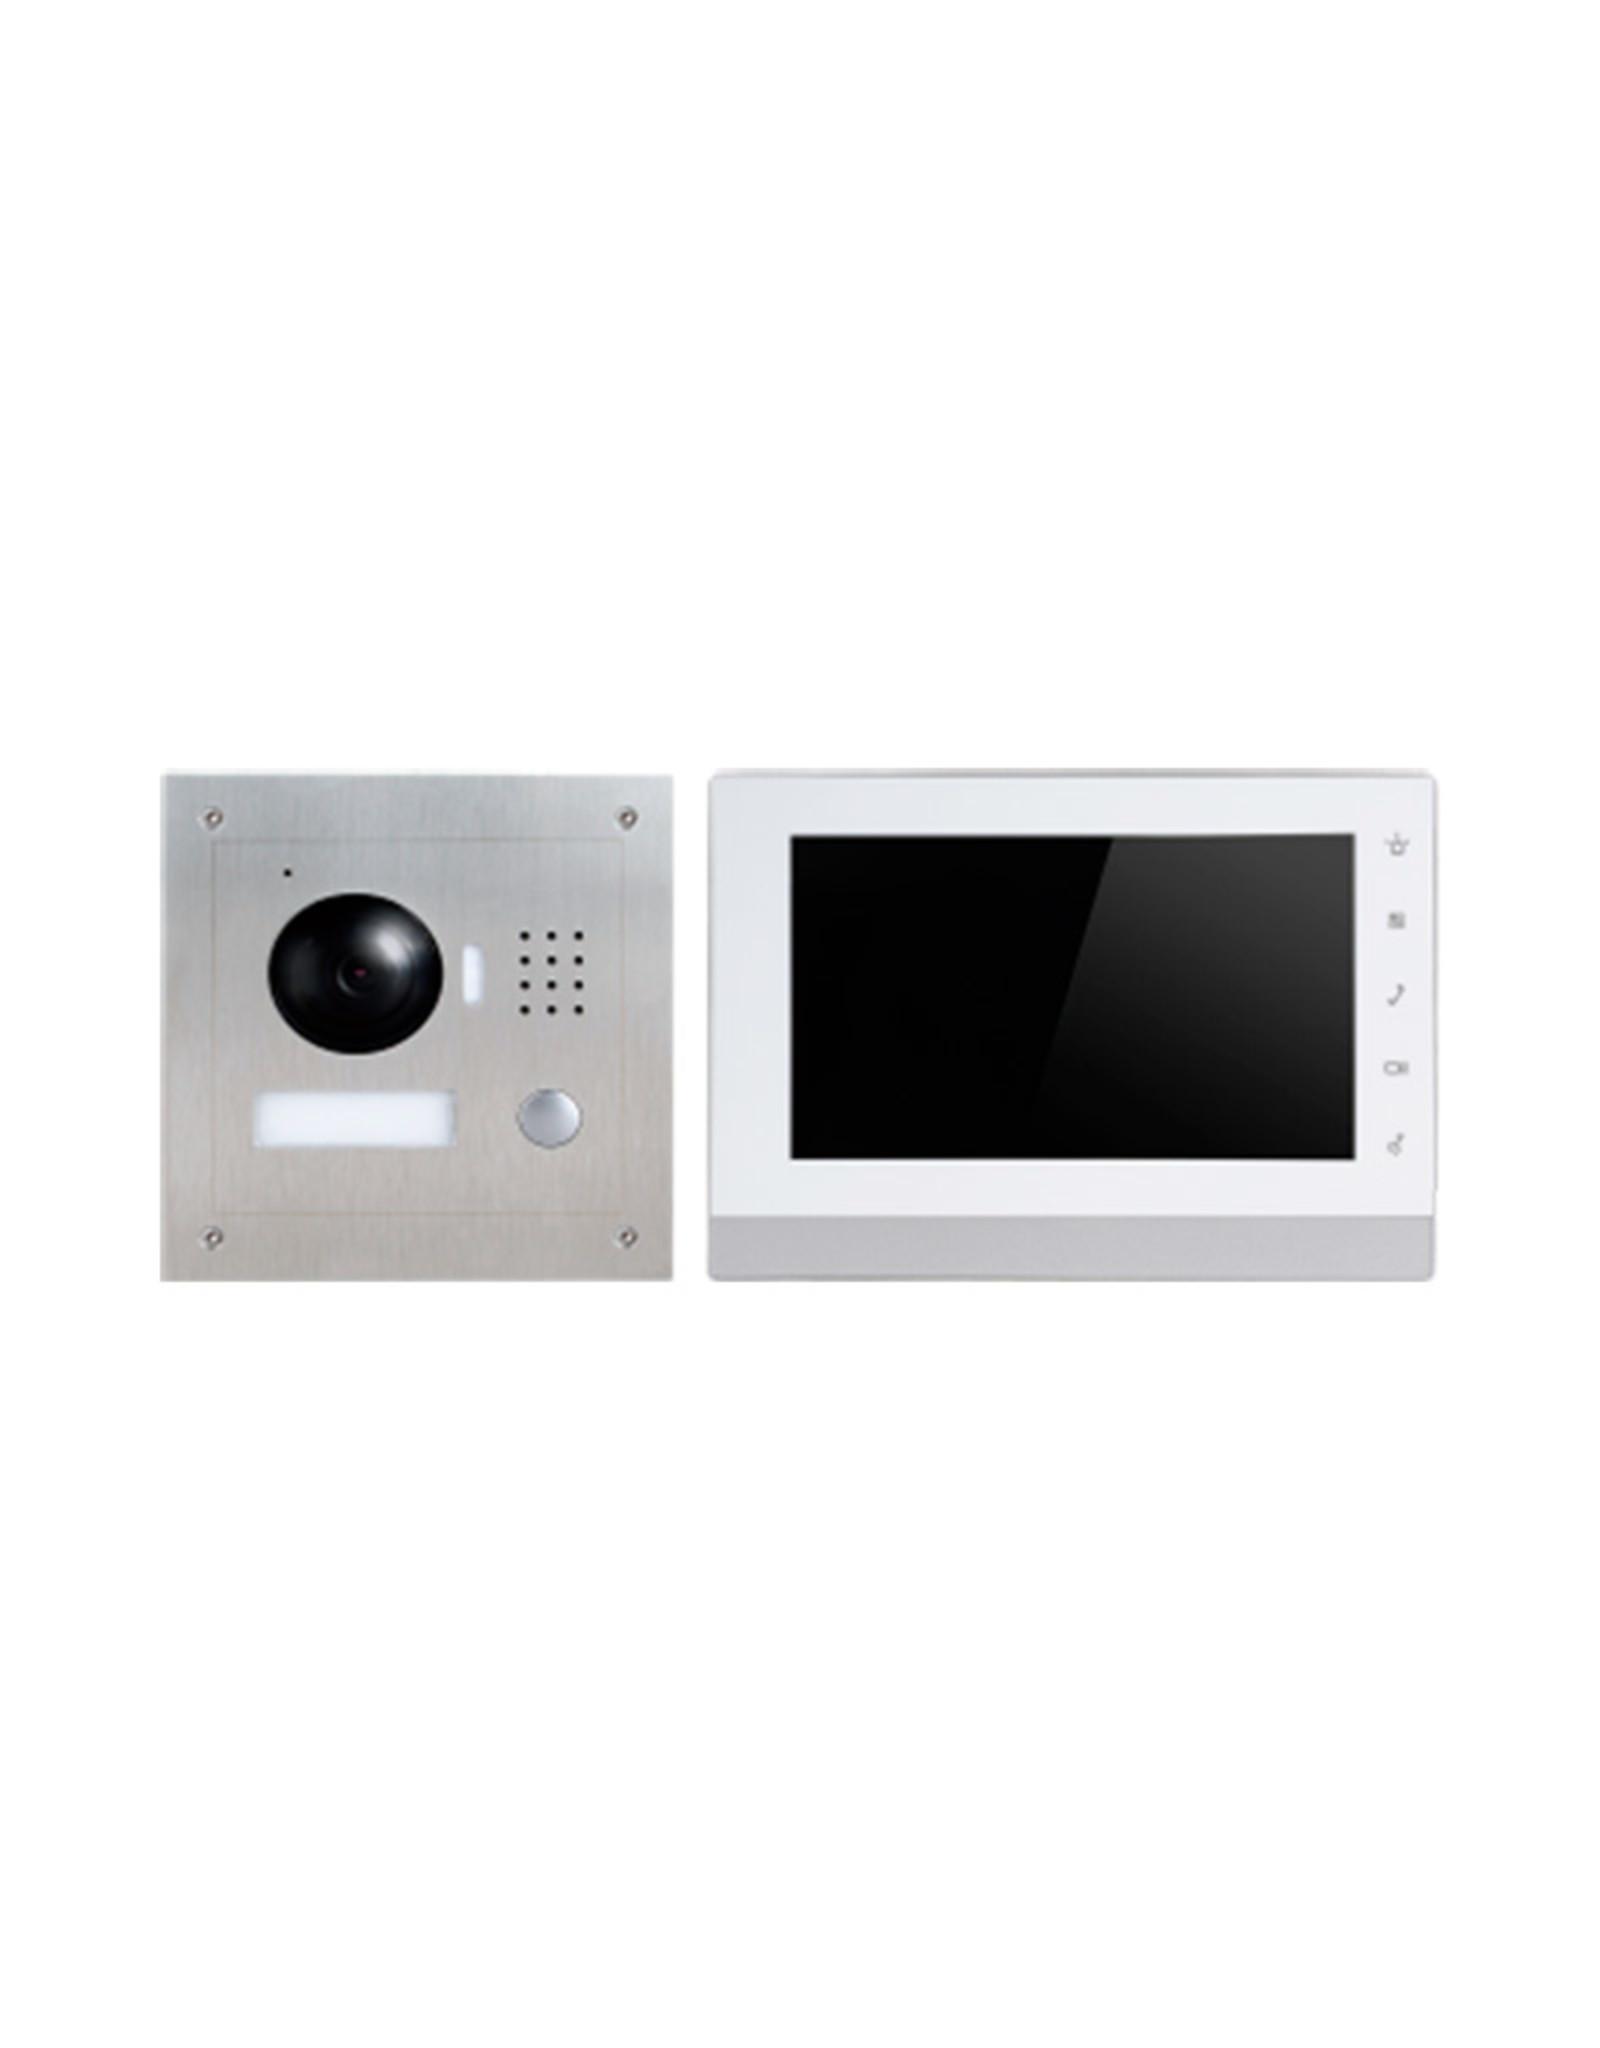 X-Security X-Security VTK-S2000-2-V2 2 Draads intercom kit